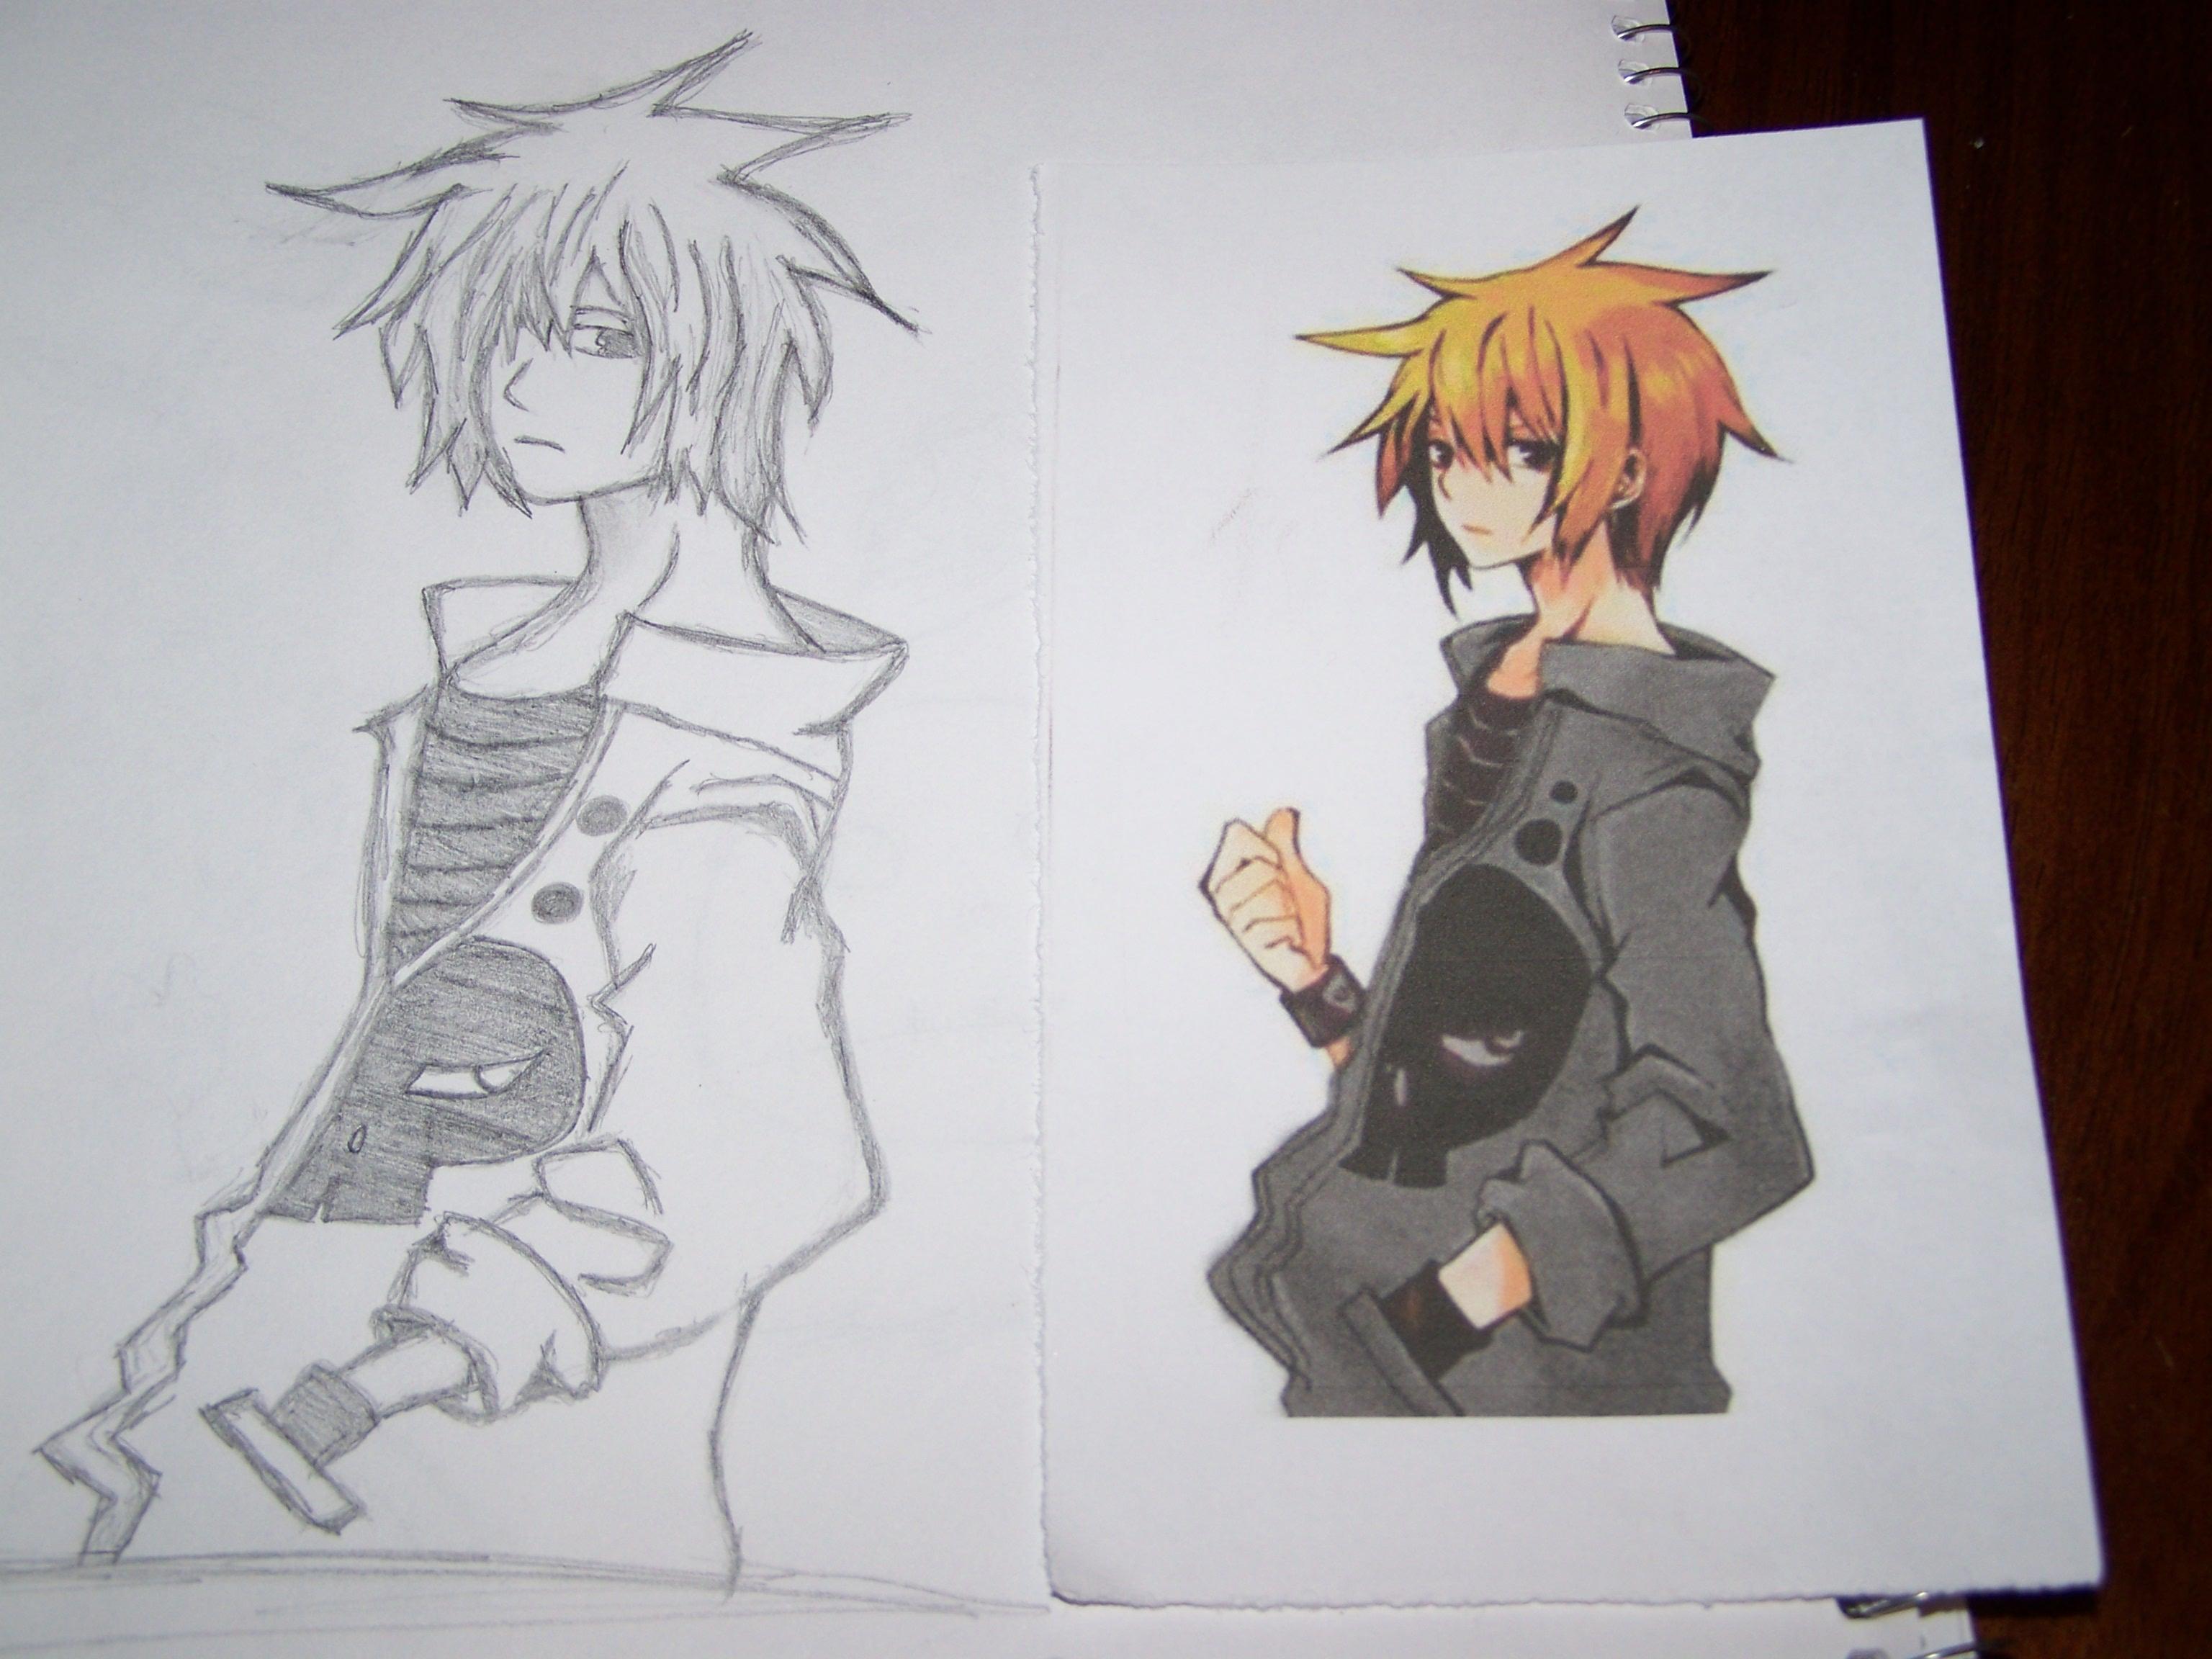 Wallpaper Drawing Illustration Anime Artwork Dude Boy